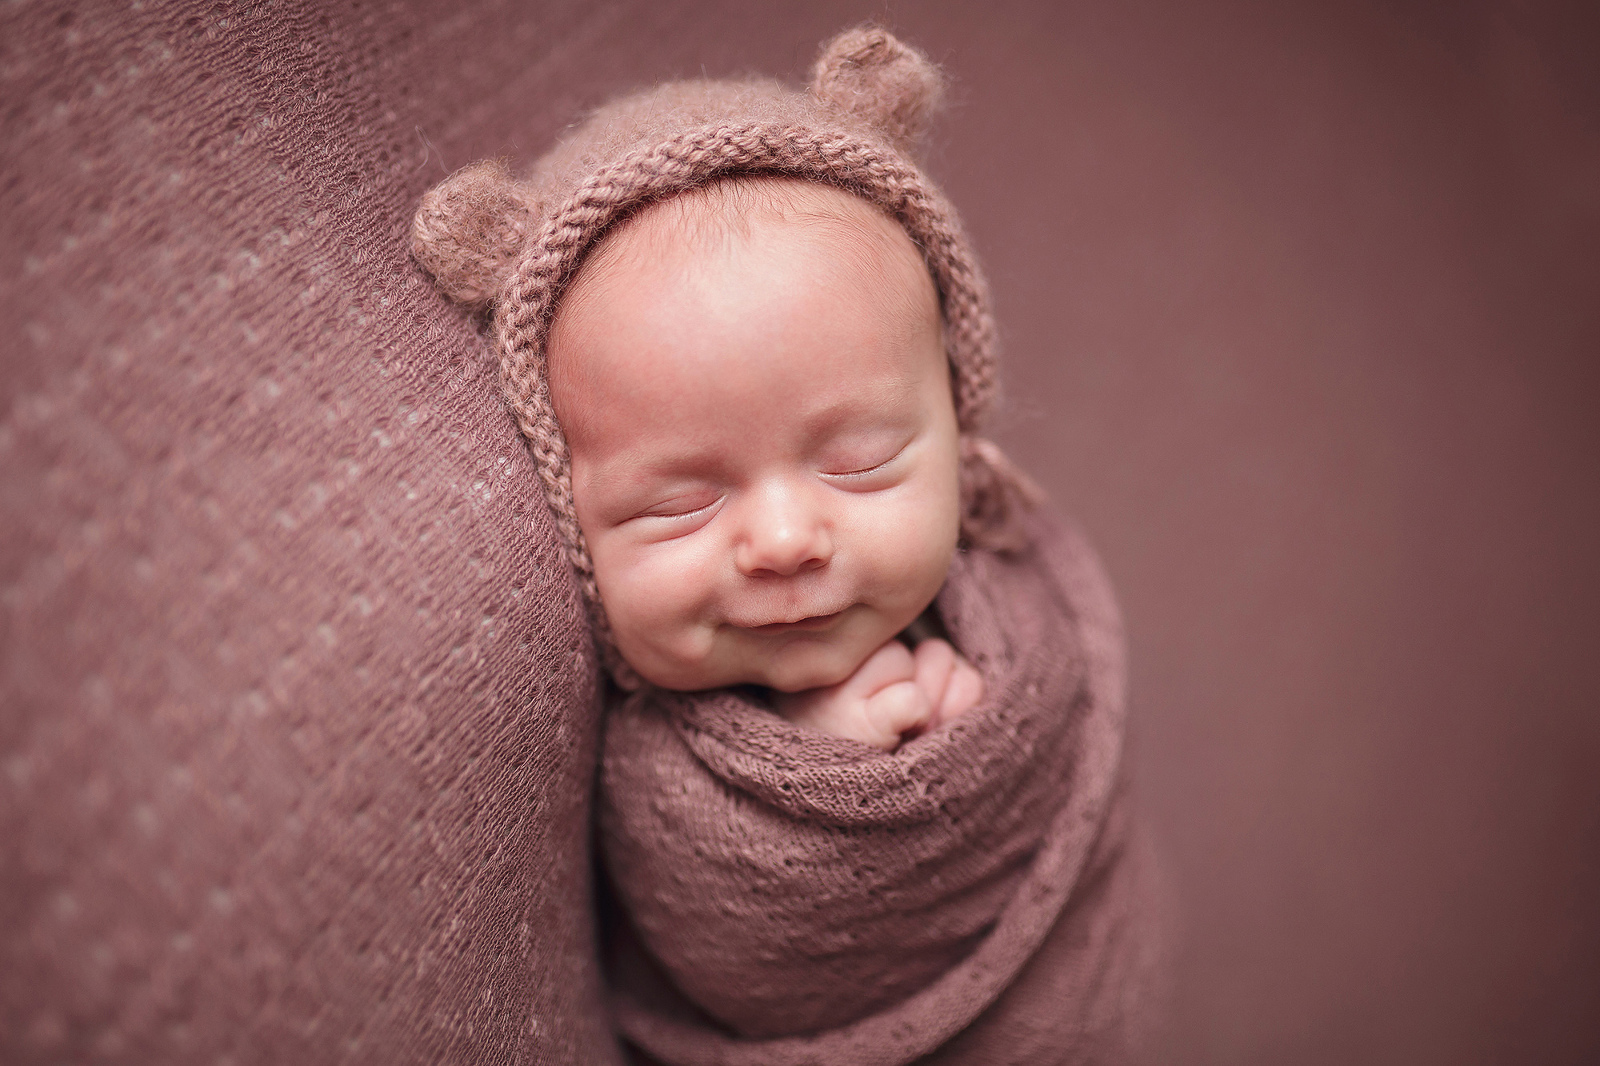 knit baby bear hat on a newborn